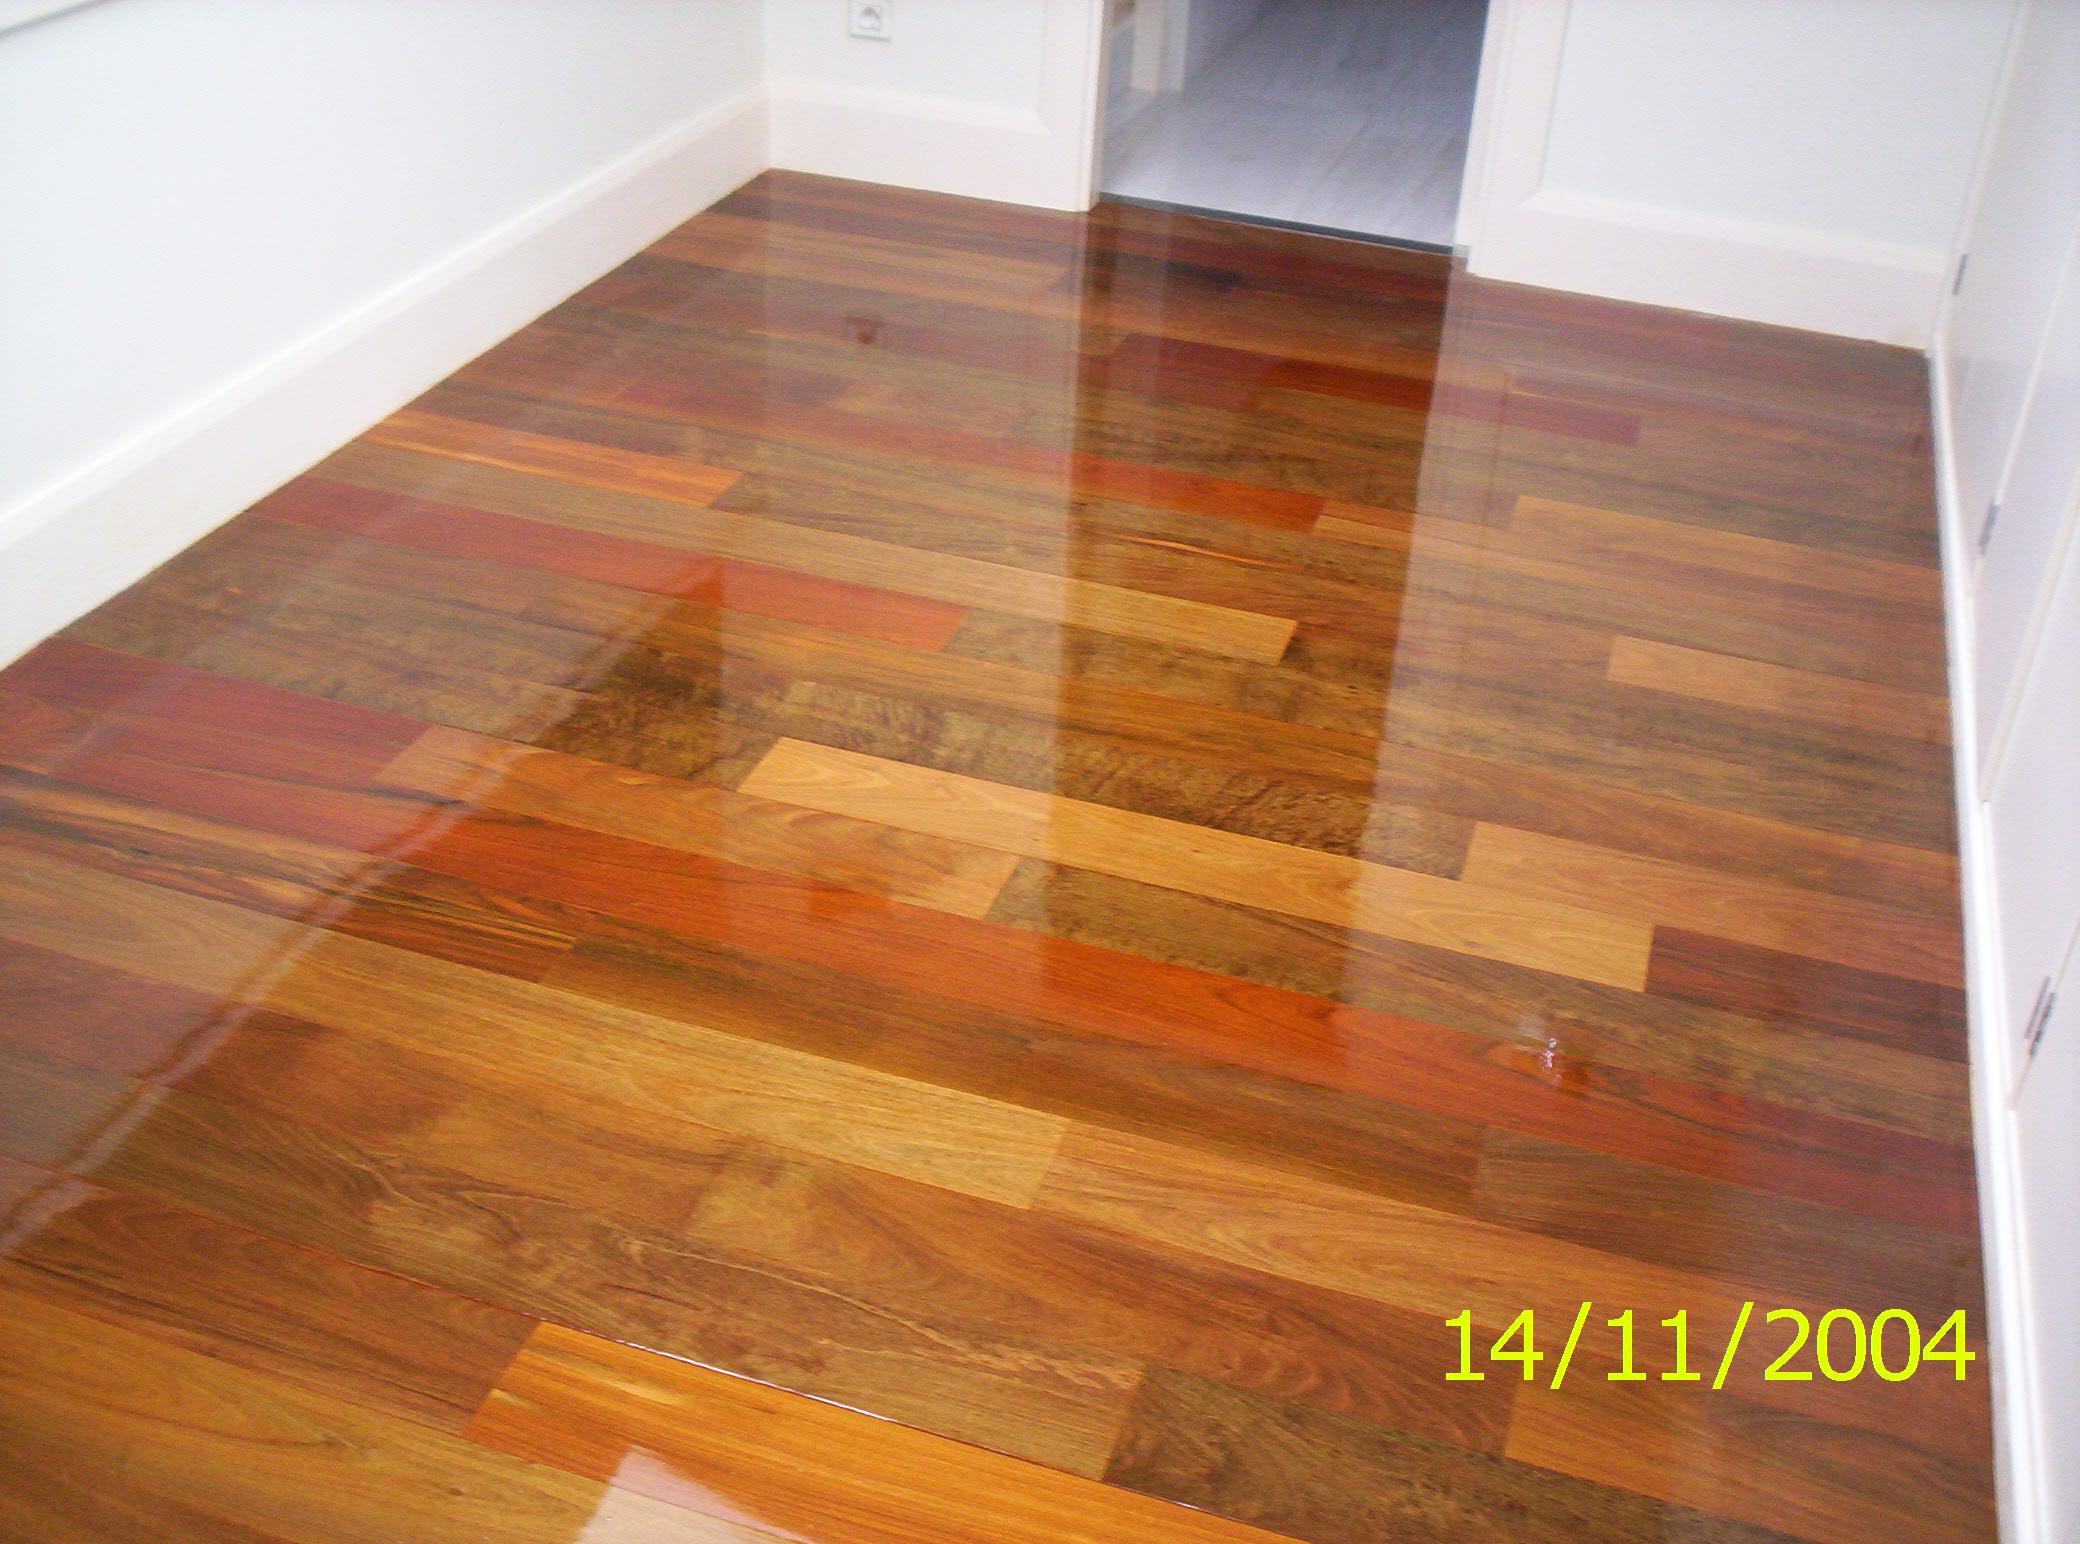 Tarima de ipe interior barnizado brillo topmadera - Tarima madera interior ...